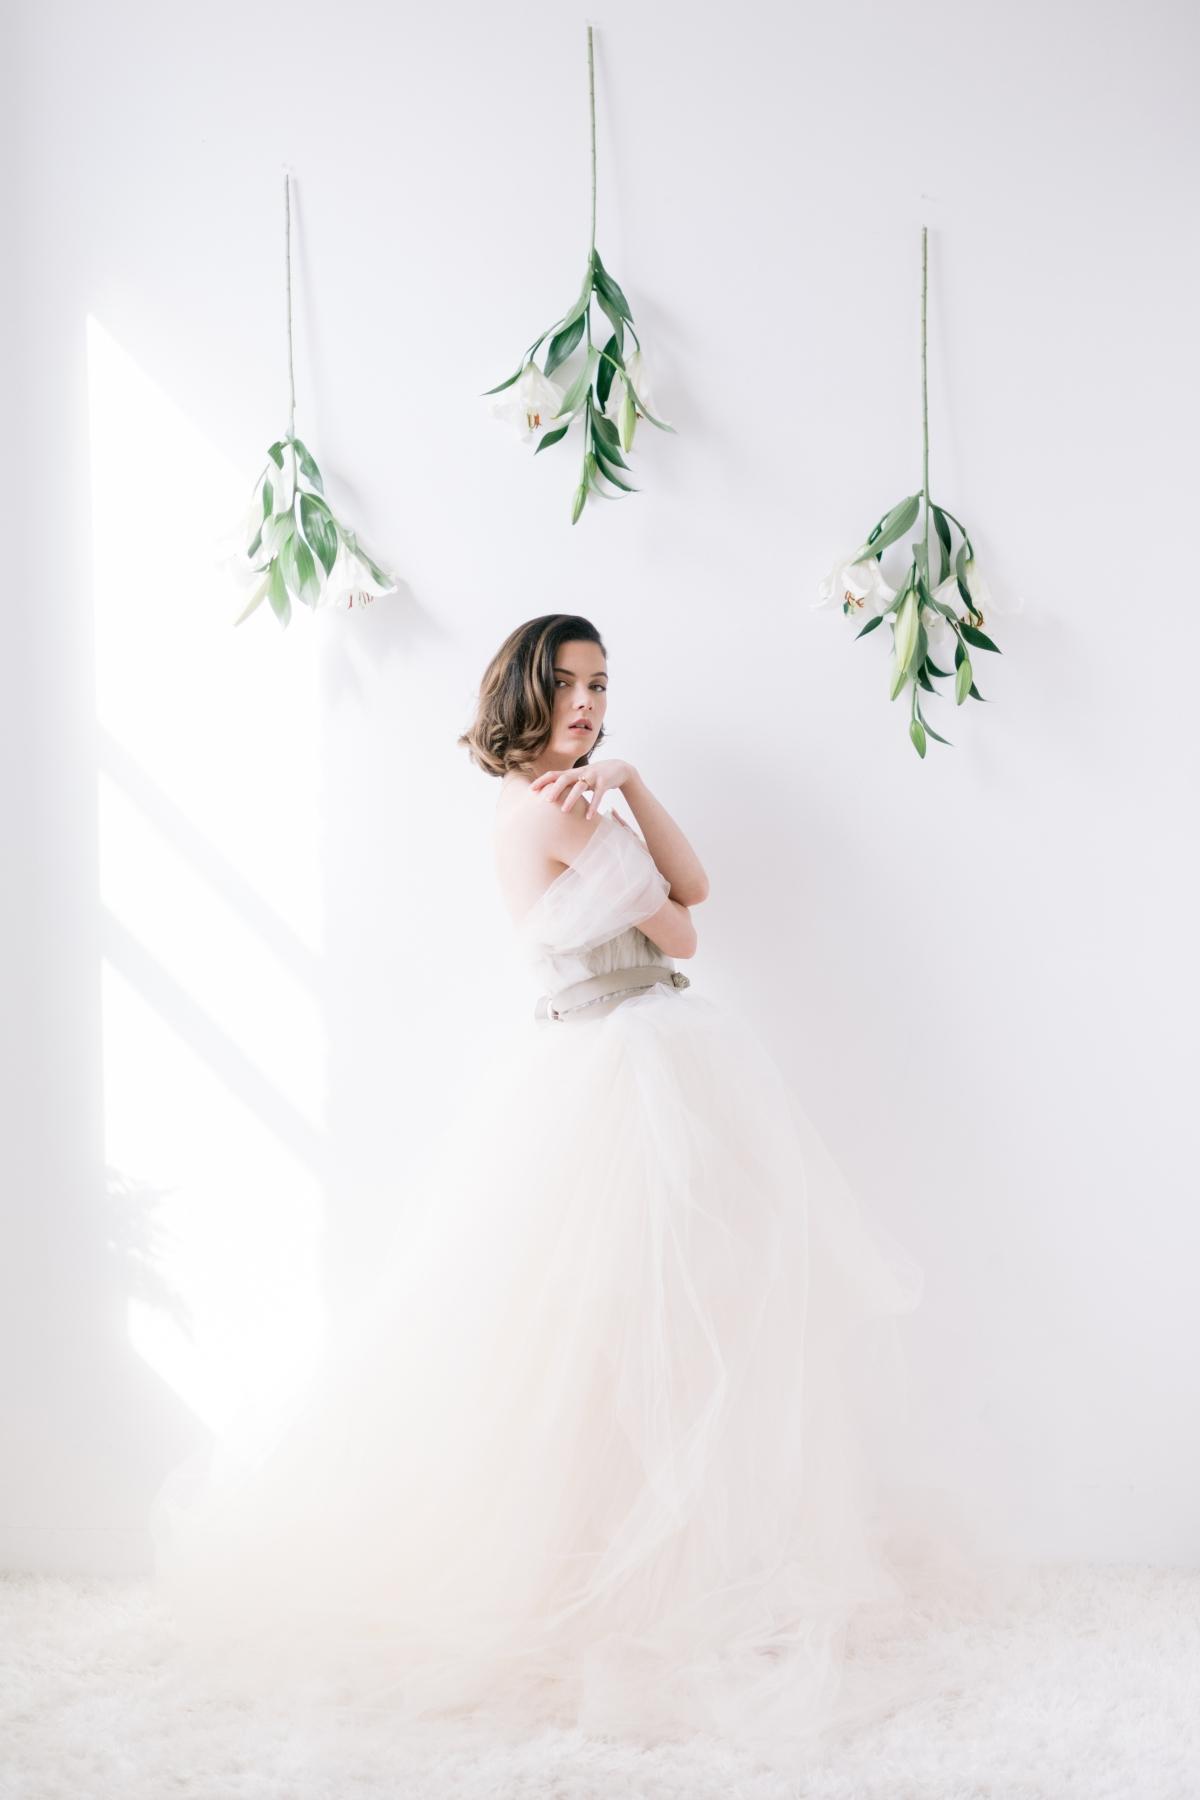 Laura Lanzerotte Bridal Danielle Heinson Photography 30